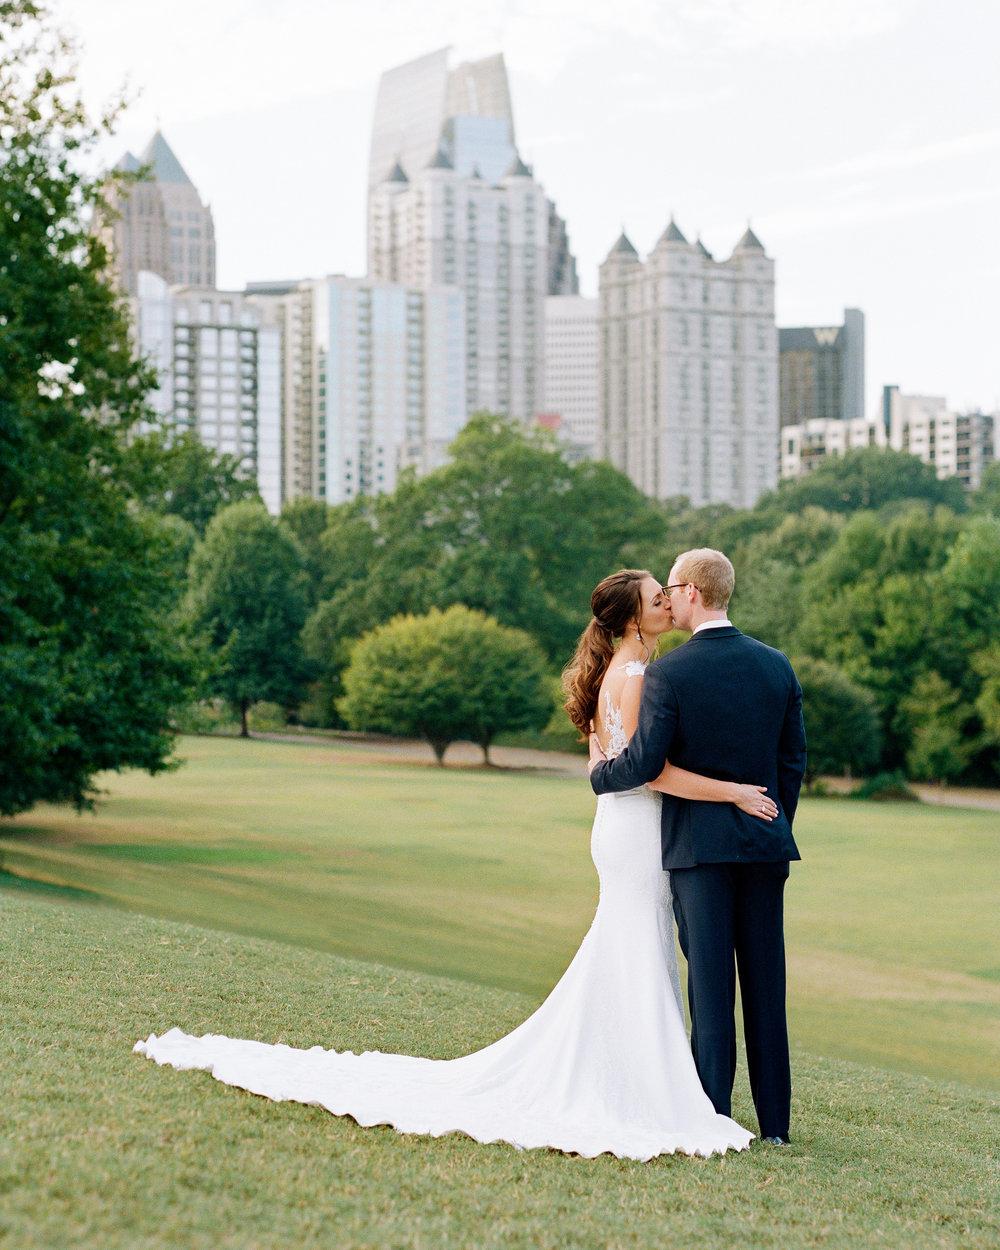 Bride and Groom in Piedmont Park Atlanta on Wedding Day